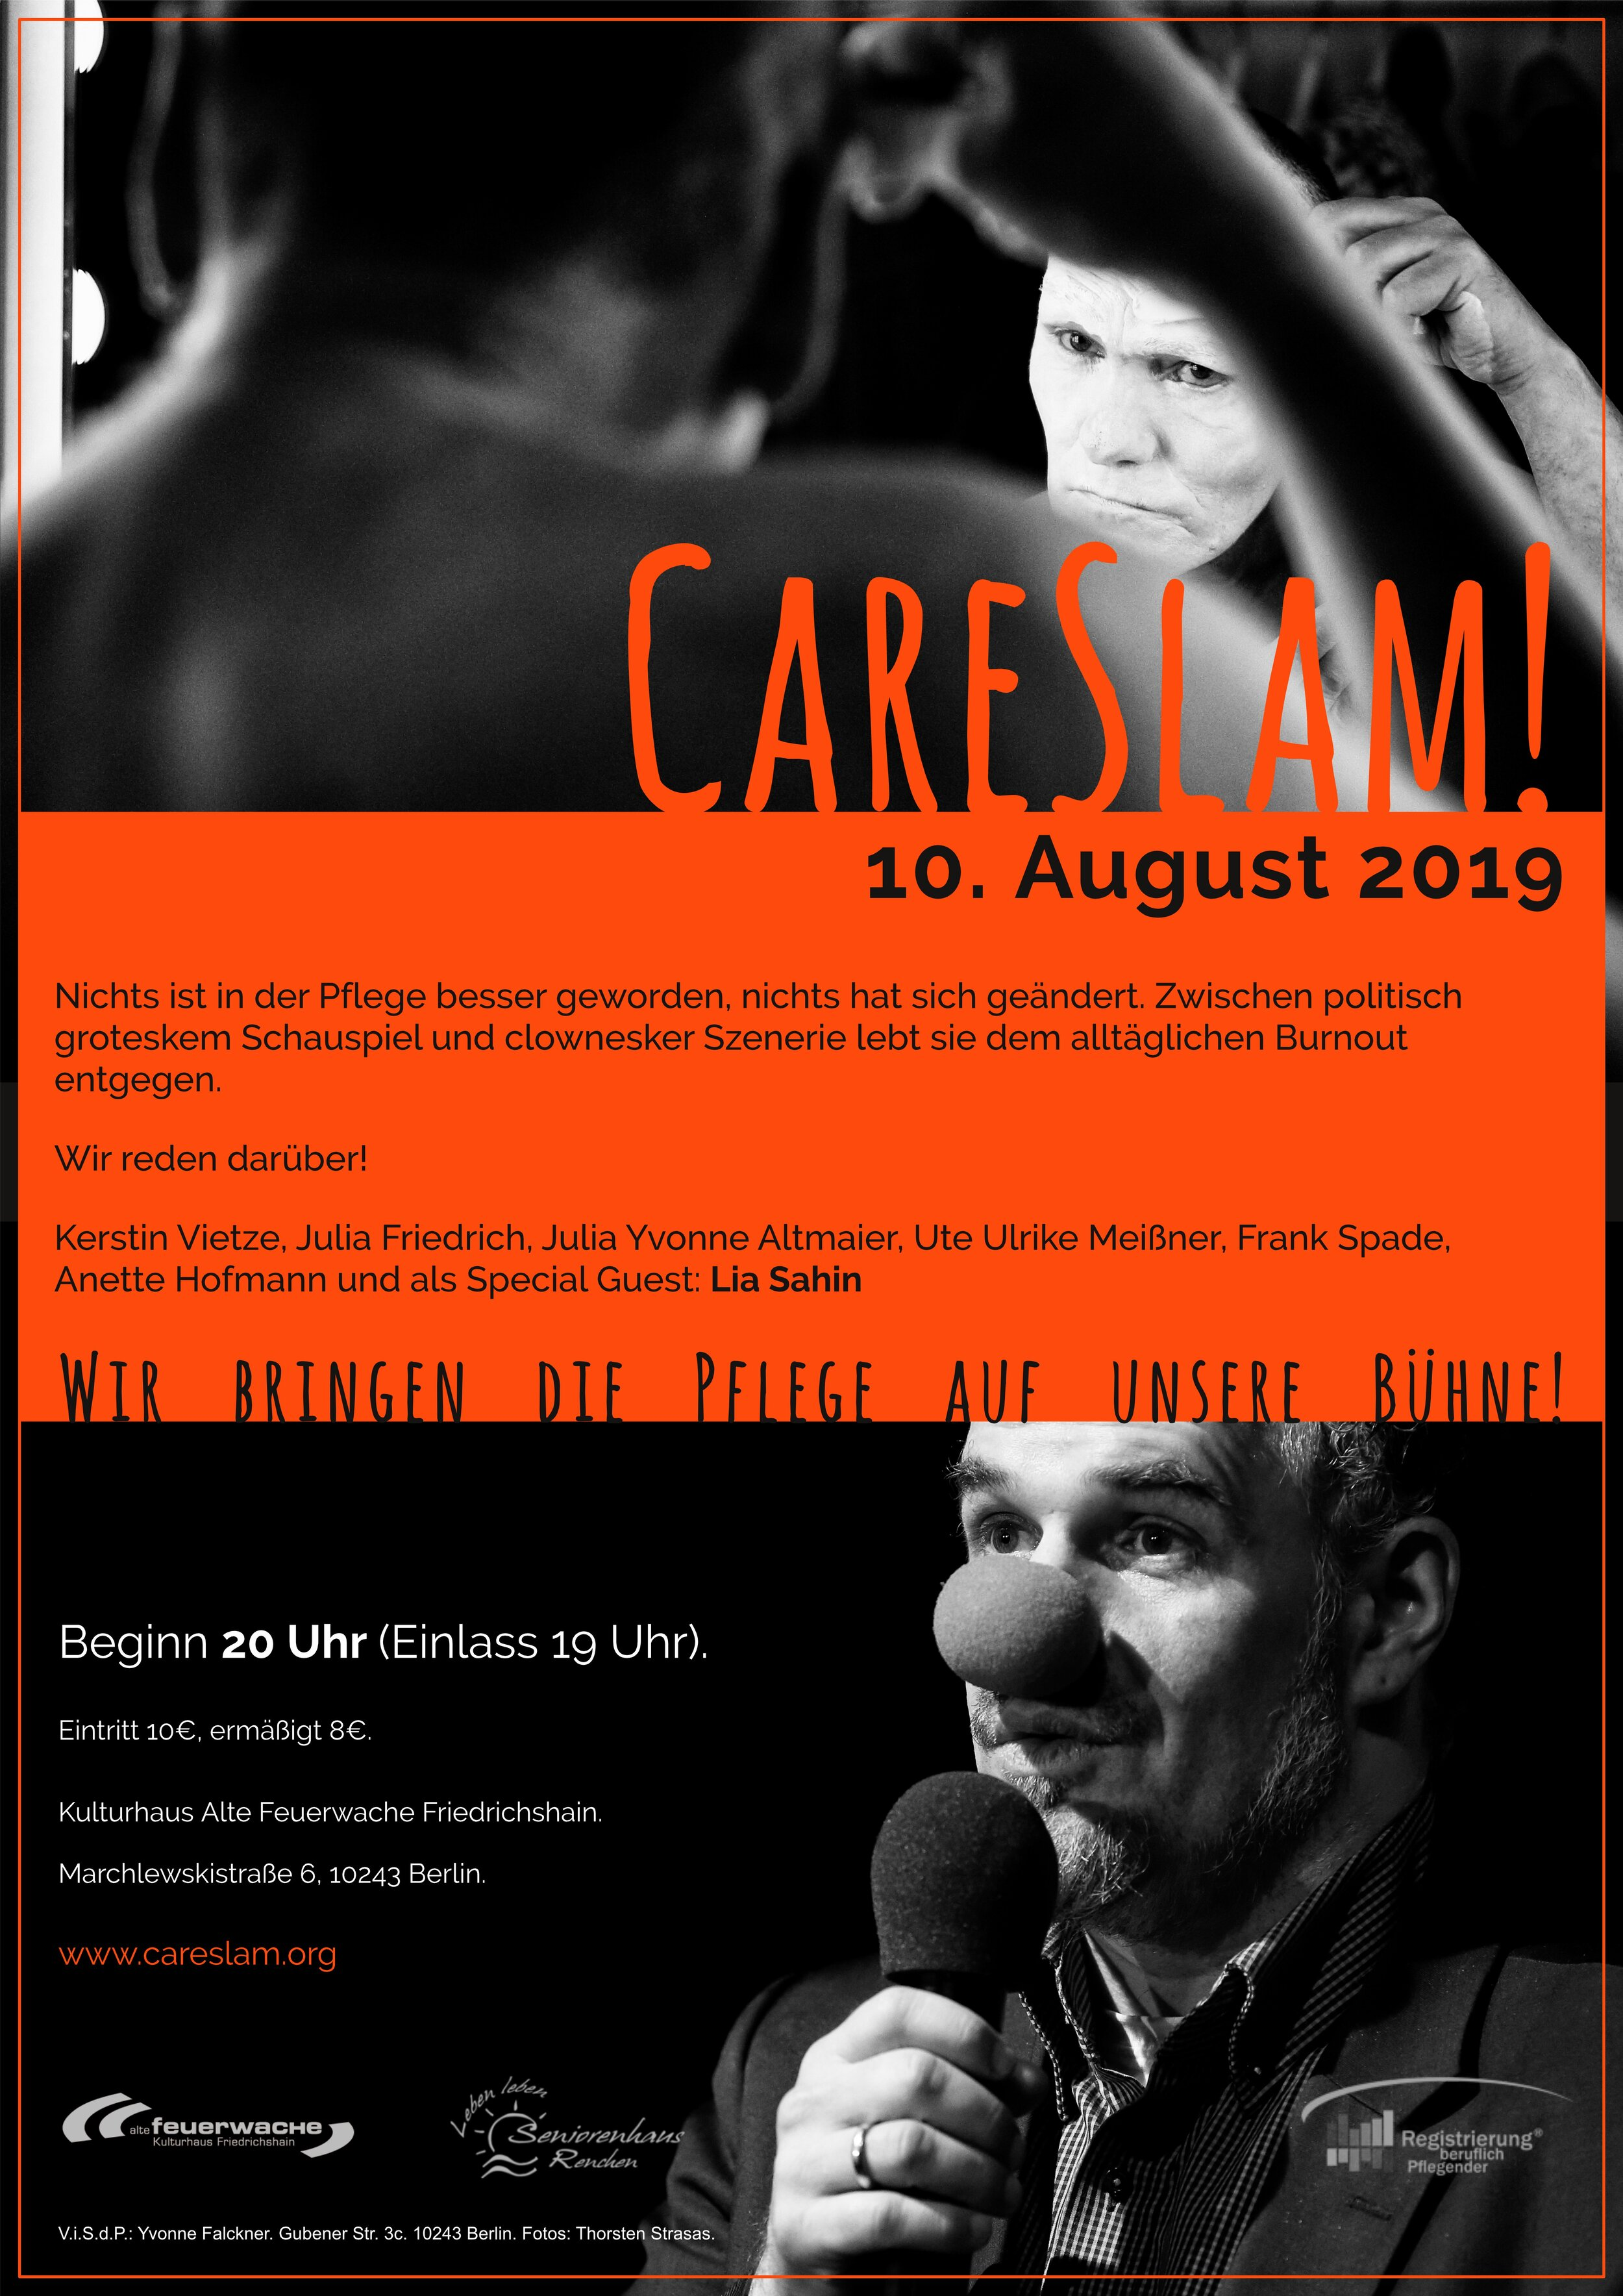 Download Plakat zum CareSlam!11. JPG [3,6MB].